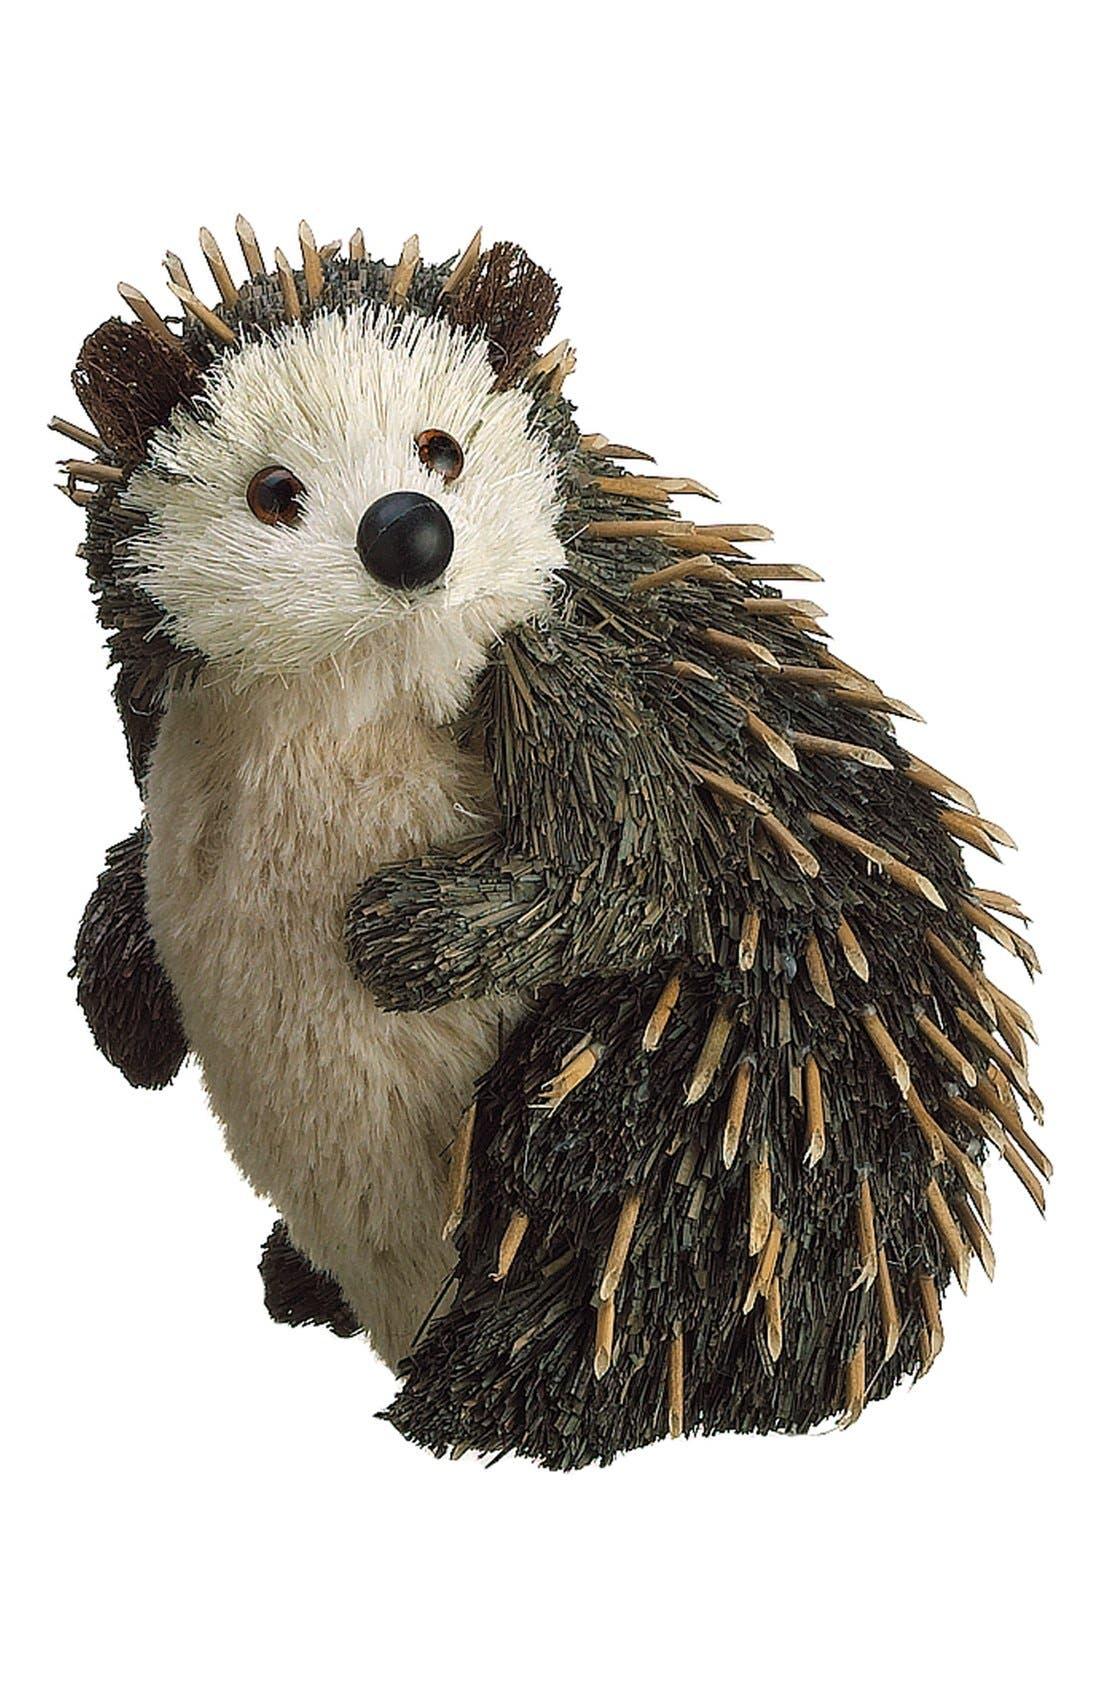 Alternate Image 1 Selected - ALLSTATE Hedgehog Figurine